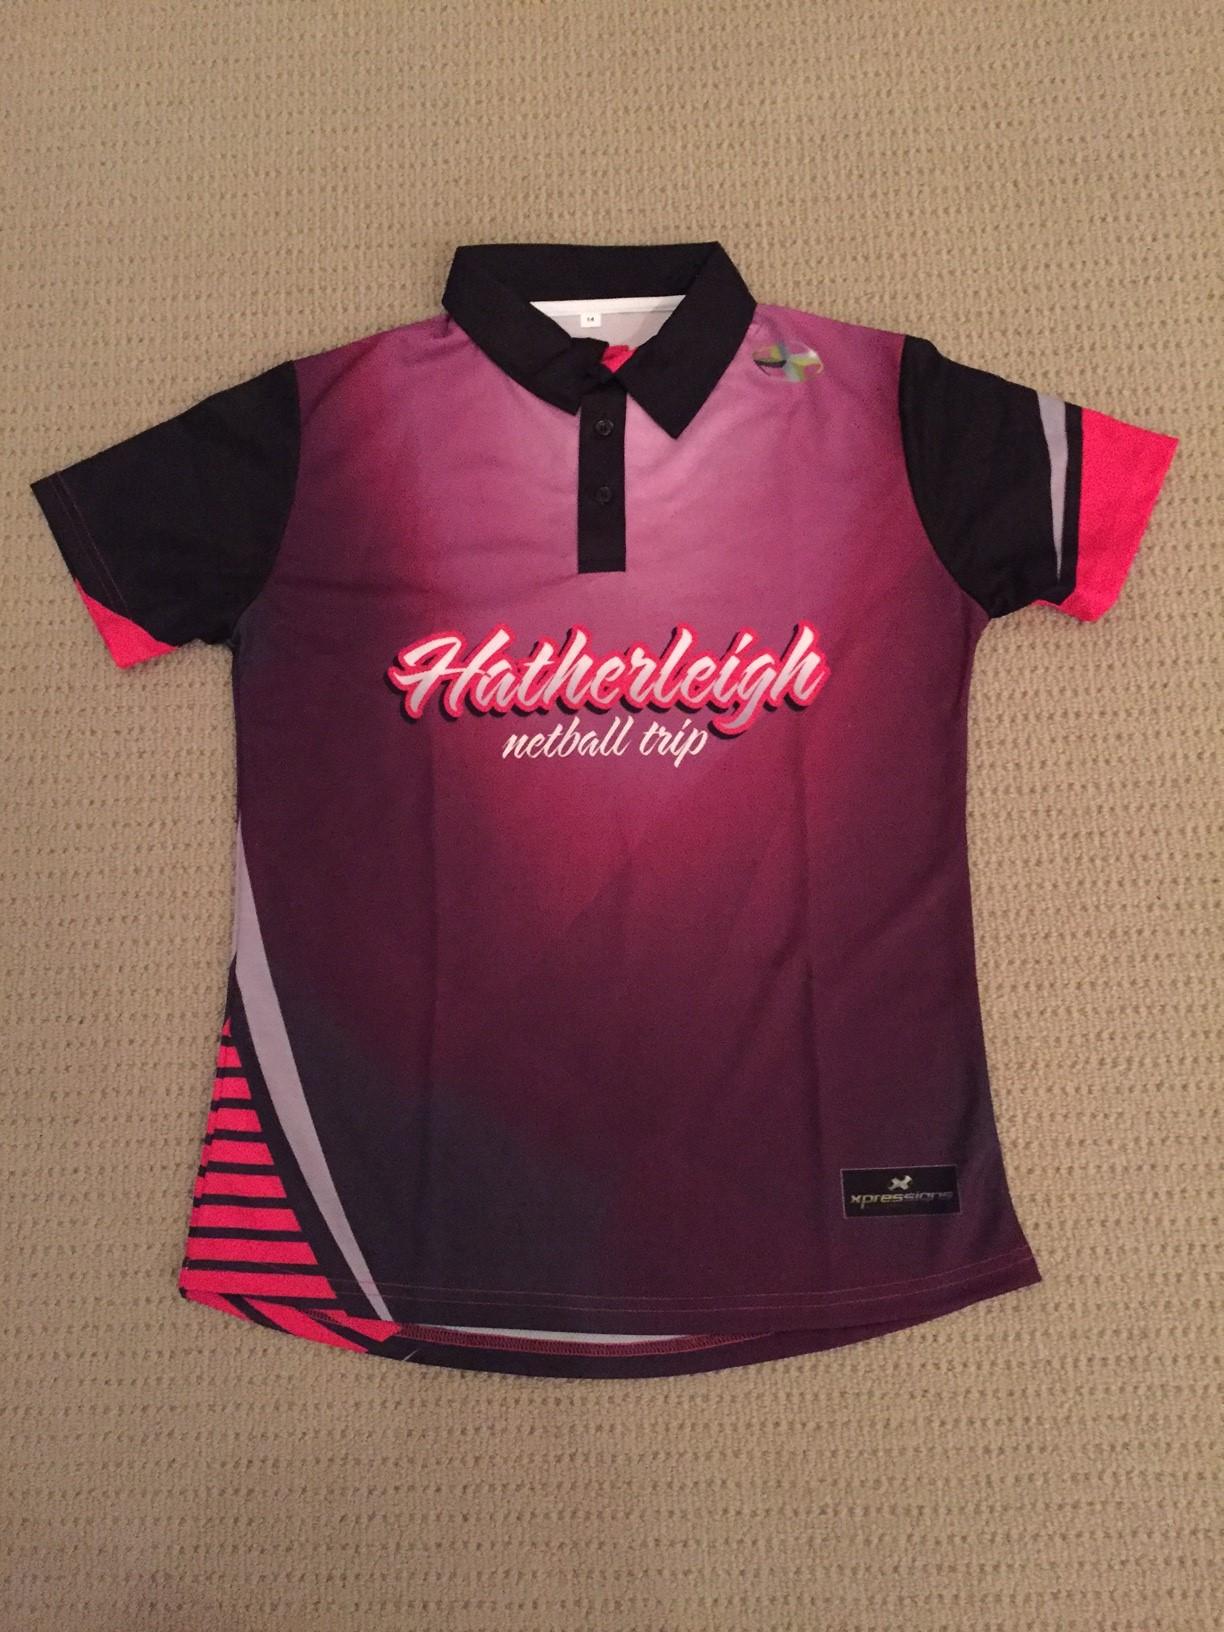 Hatherleigh Netball